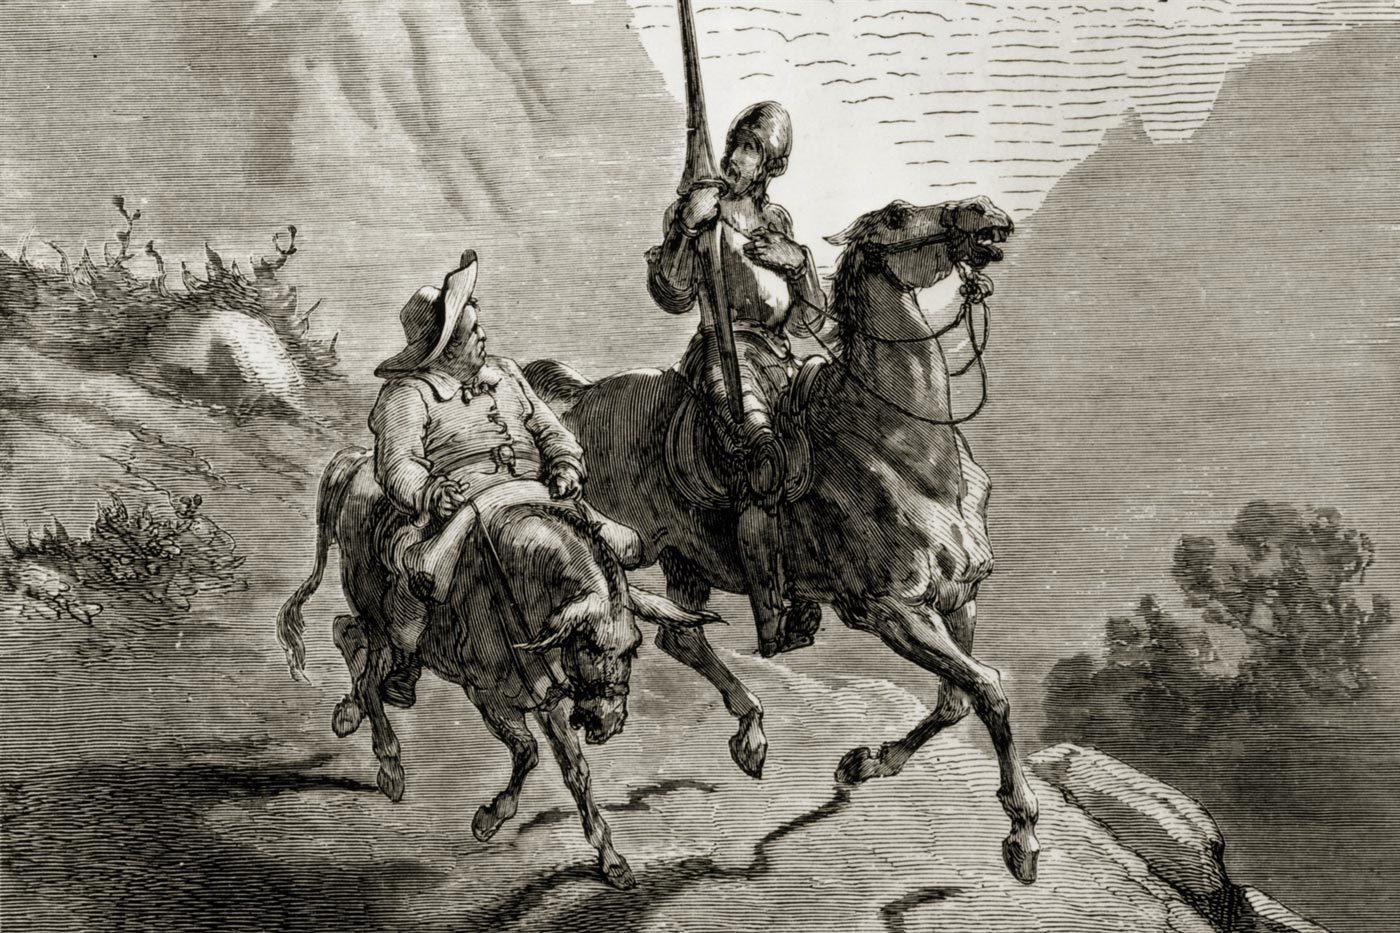 Travel Books to inspire you: Don Quixote by Miguel Cervantes © Travelwithmk.com